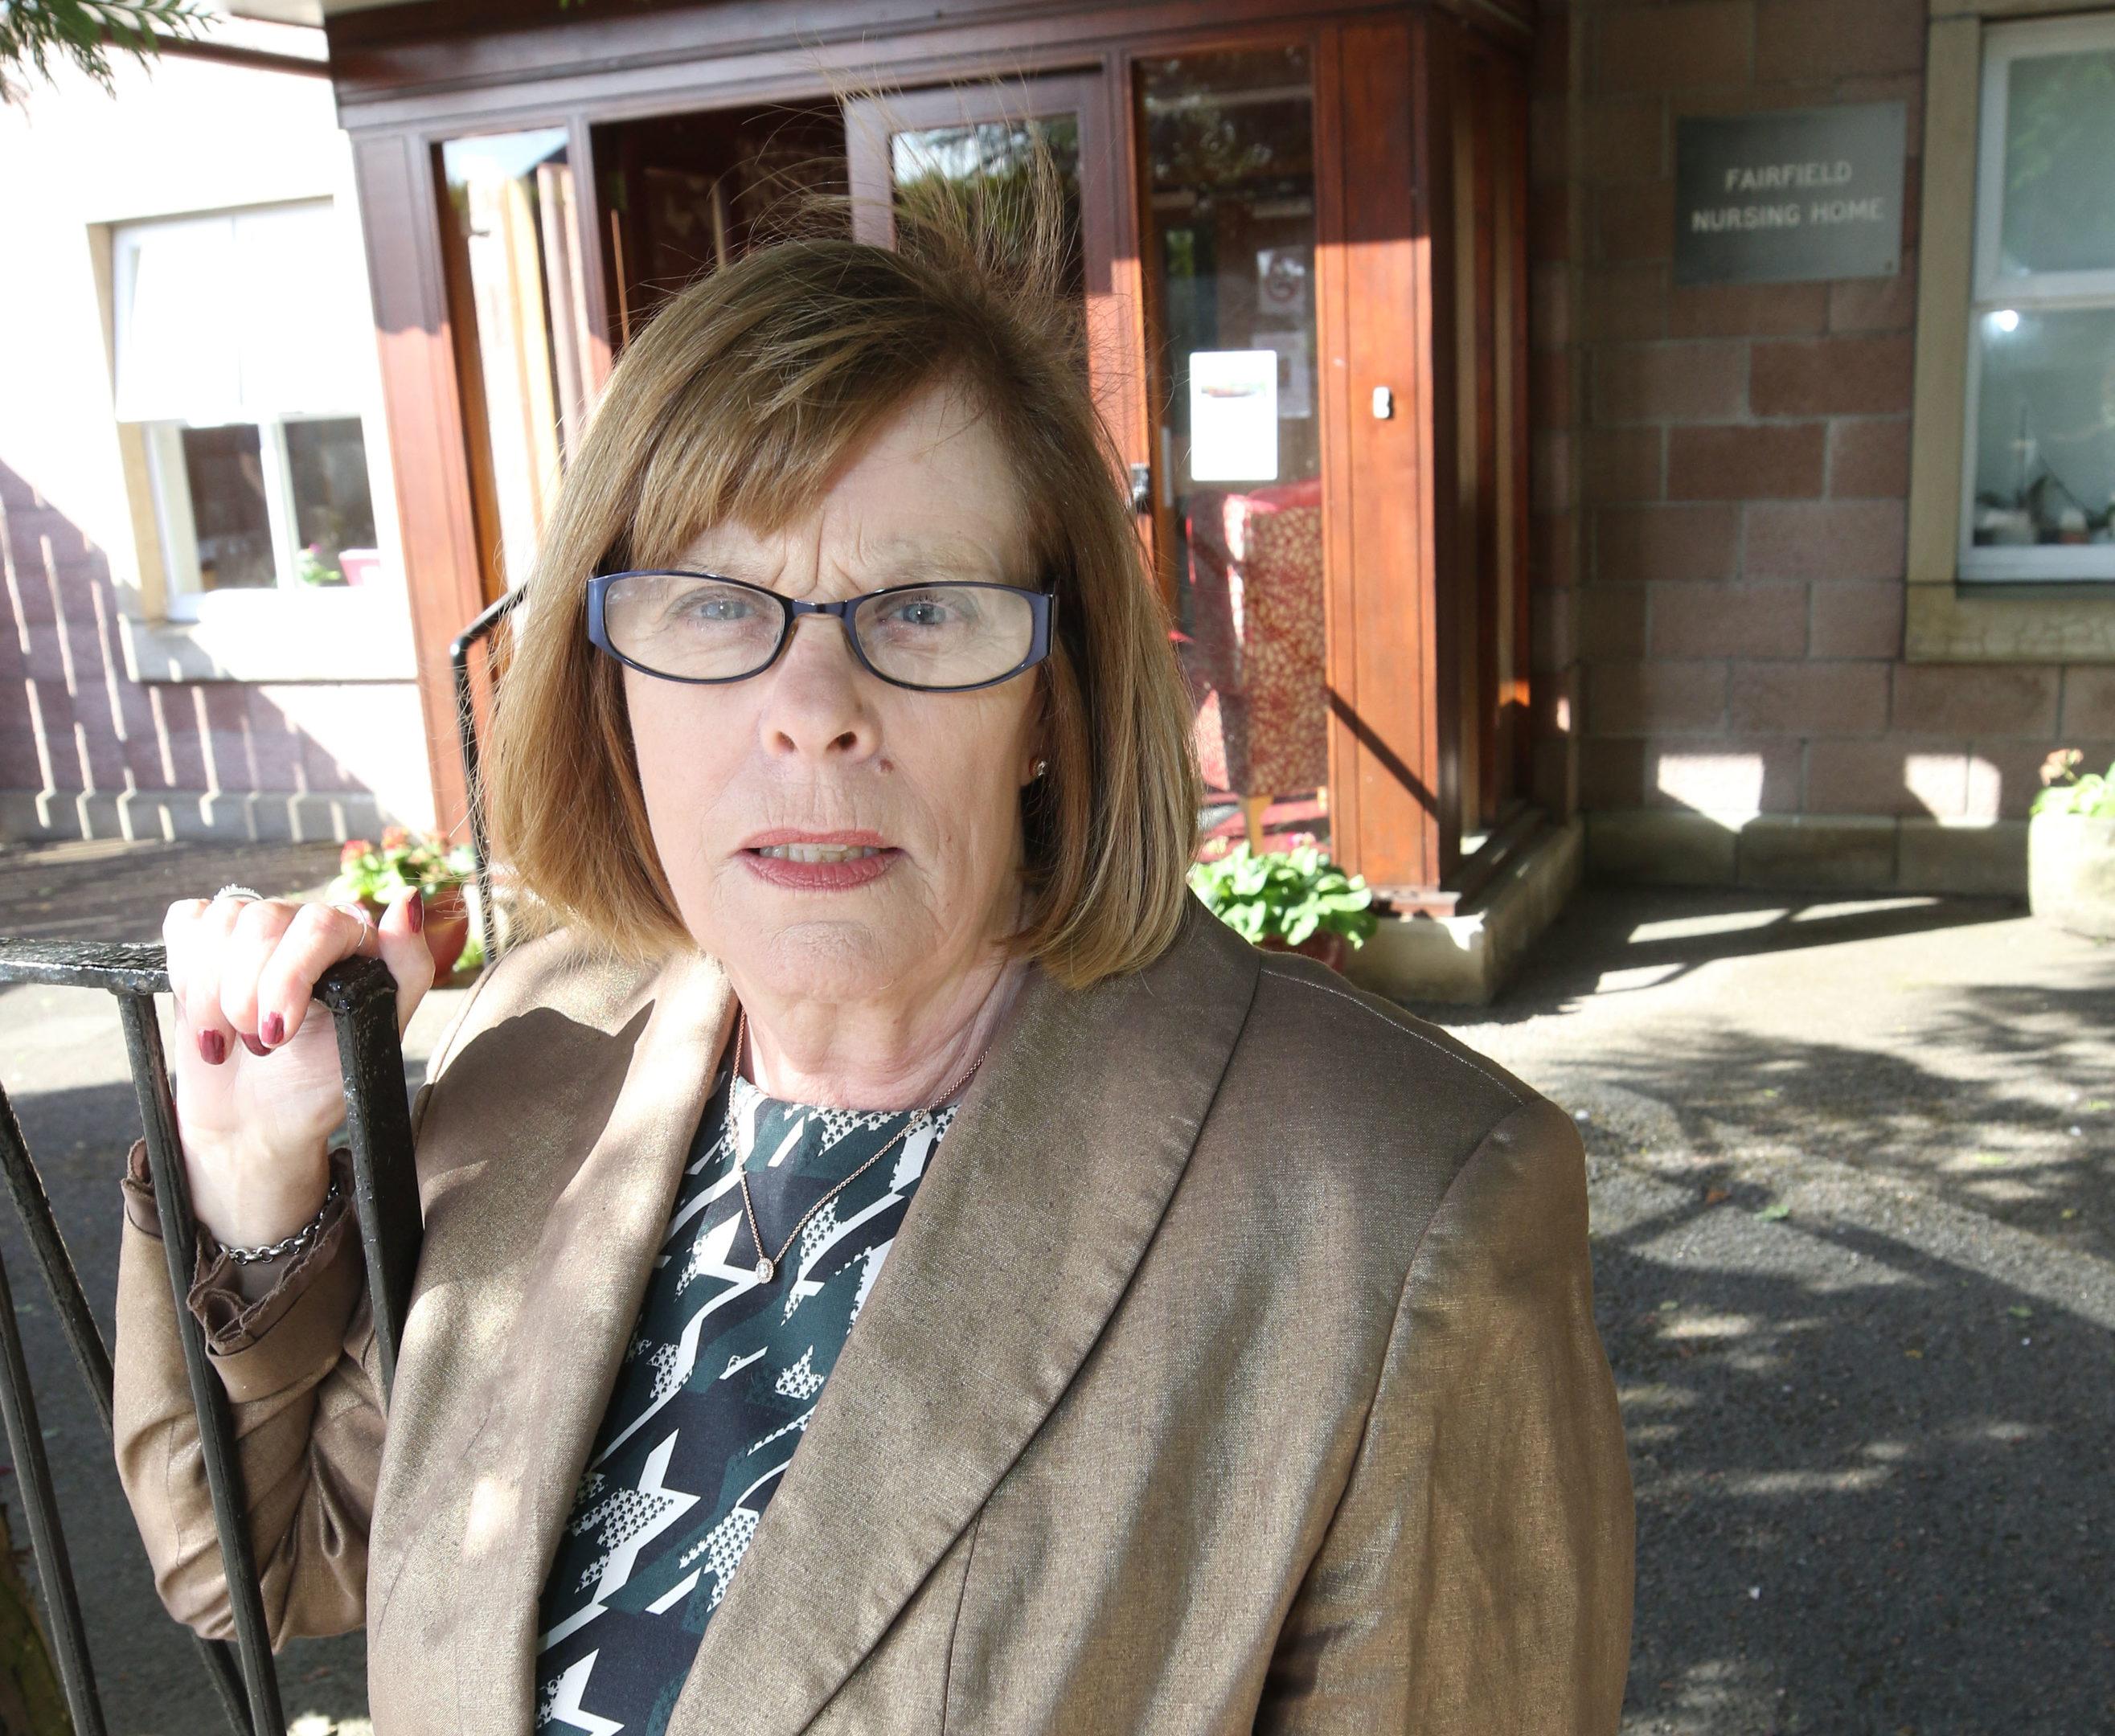 Councillor Bet McAllister outside Fairfield Nursing Home.